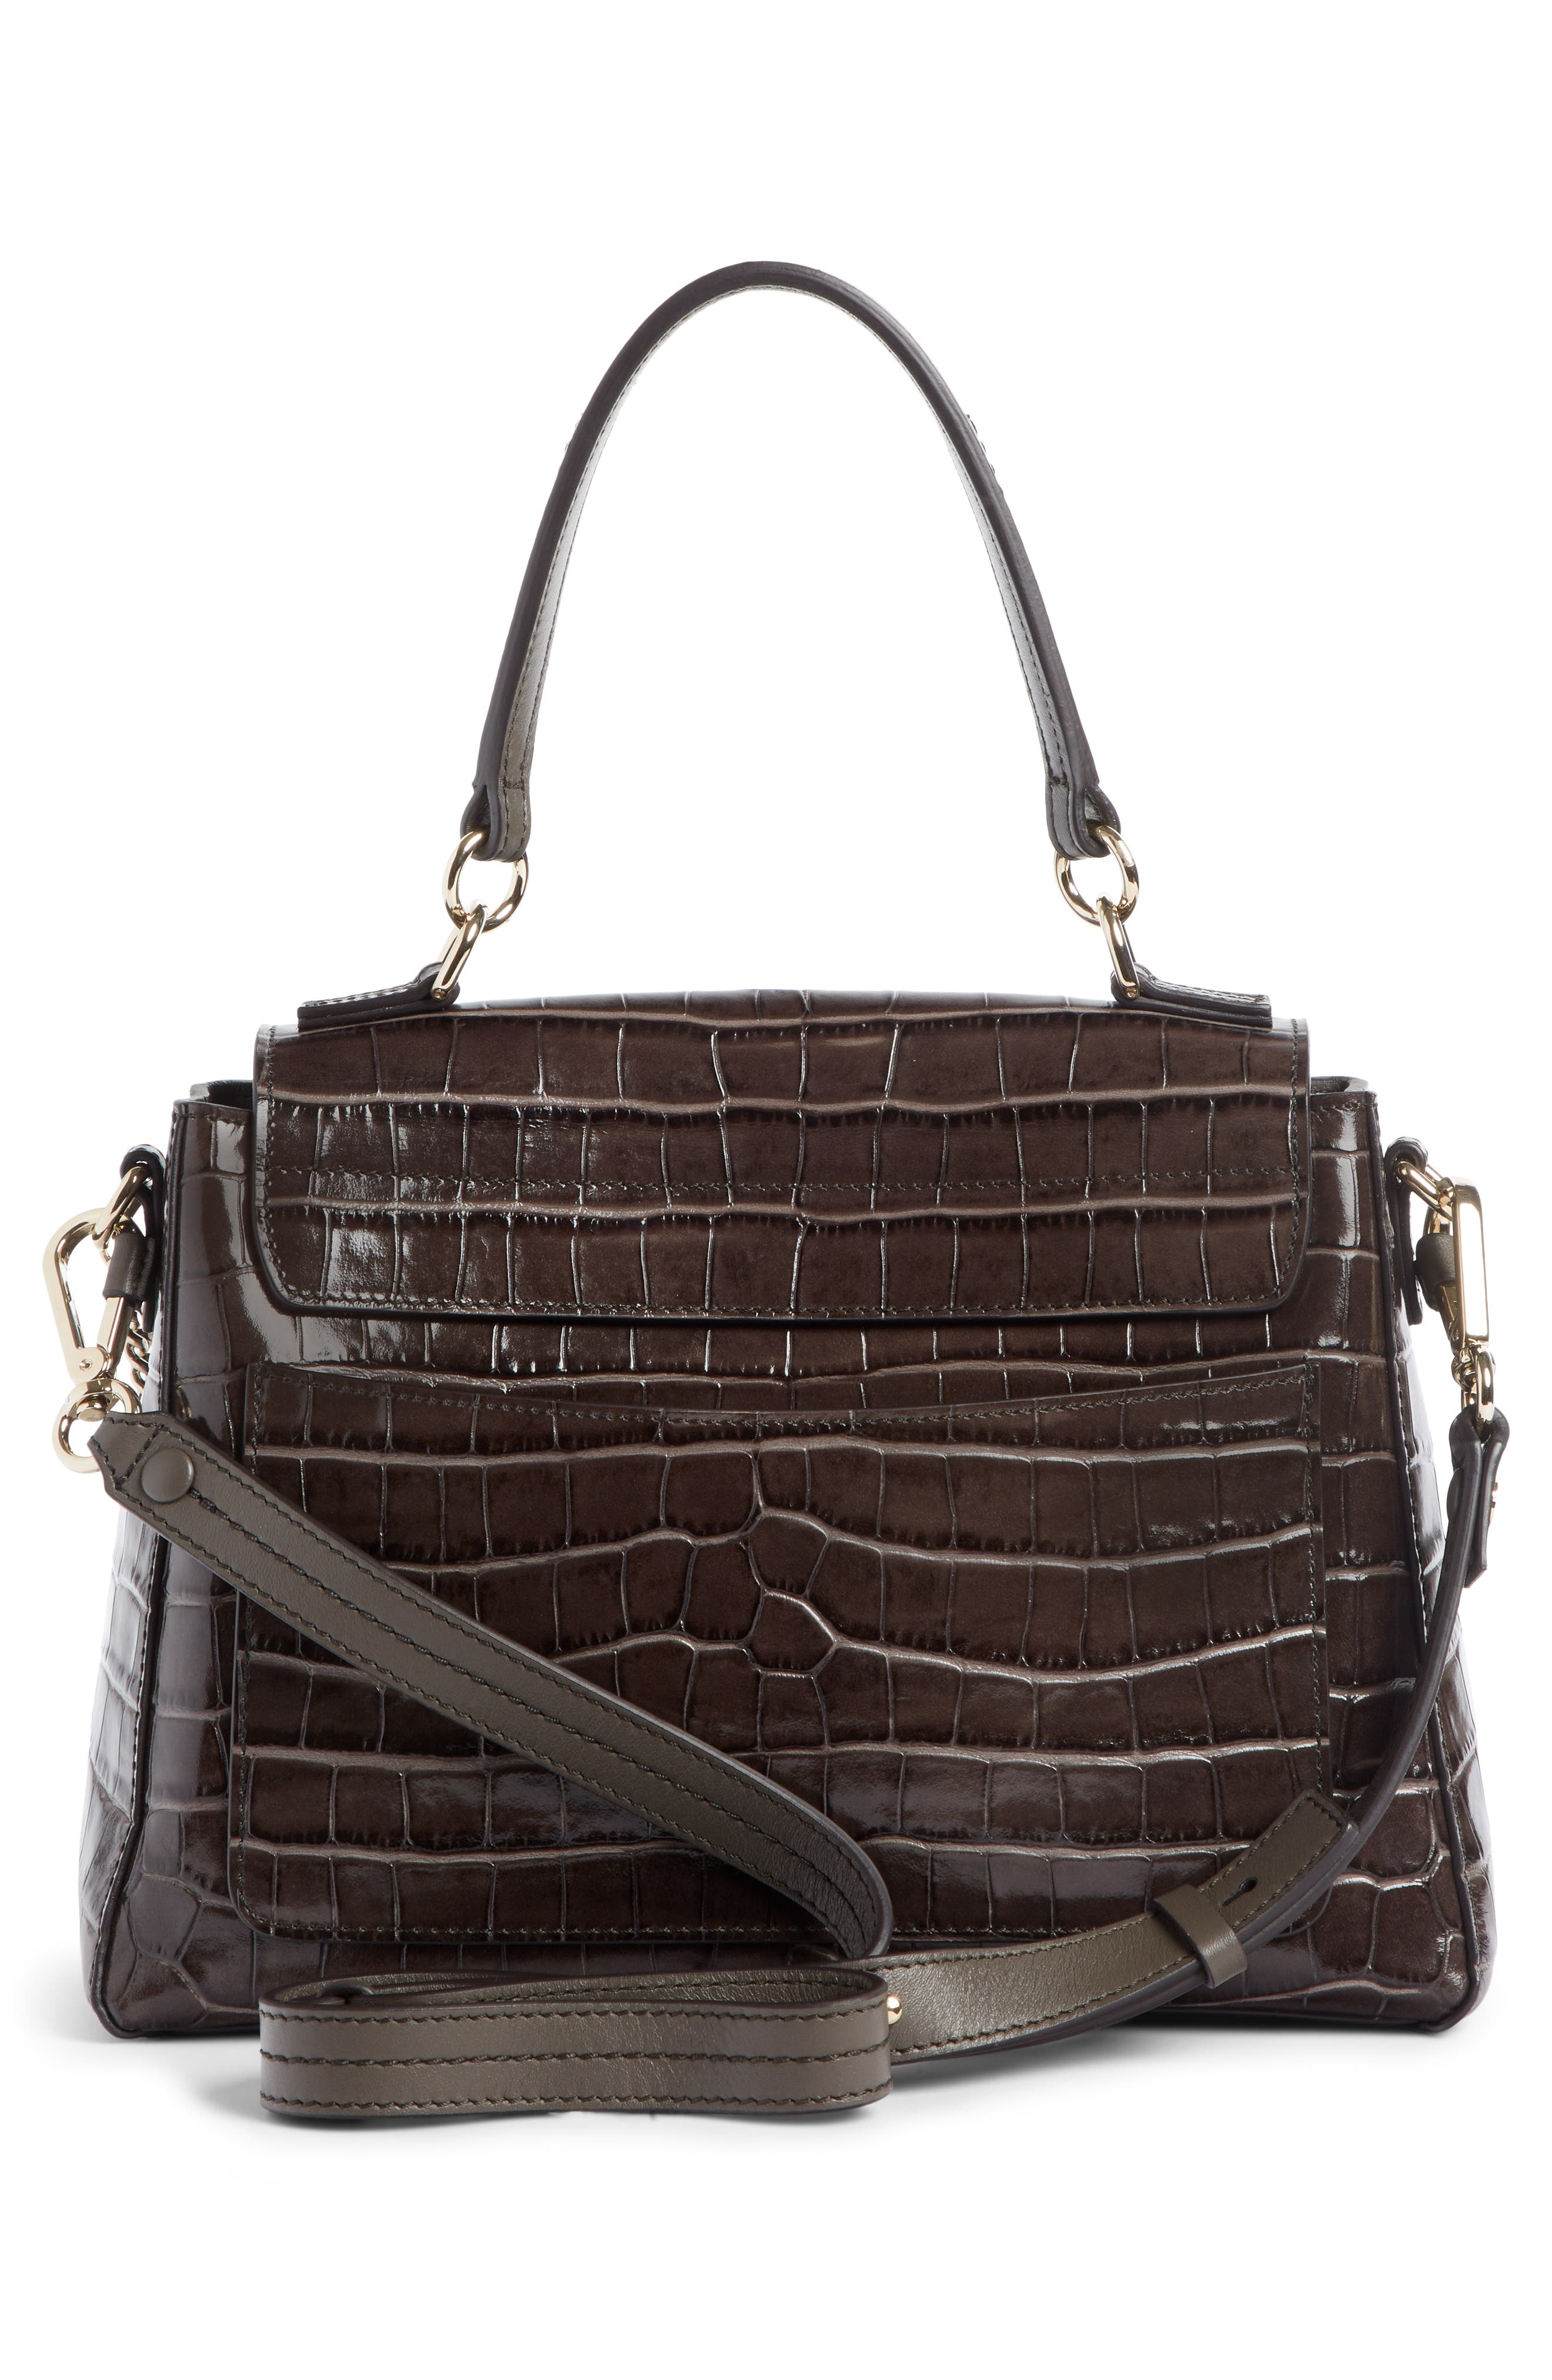 Medium Faye Day Croc Embossed Leather Shoulder Bag,                             Alternate thumbnail 3, color,                             AUTUMNAL BROWN